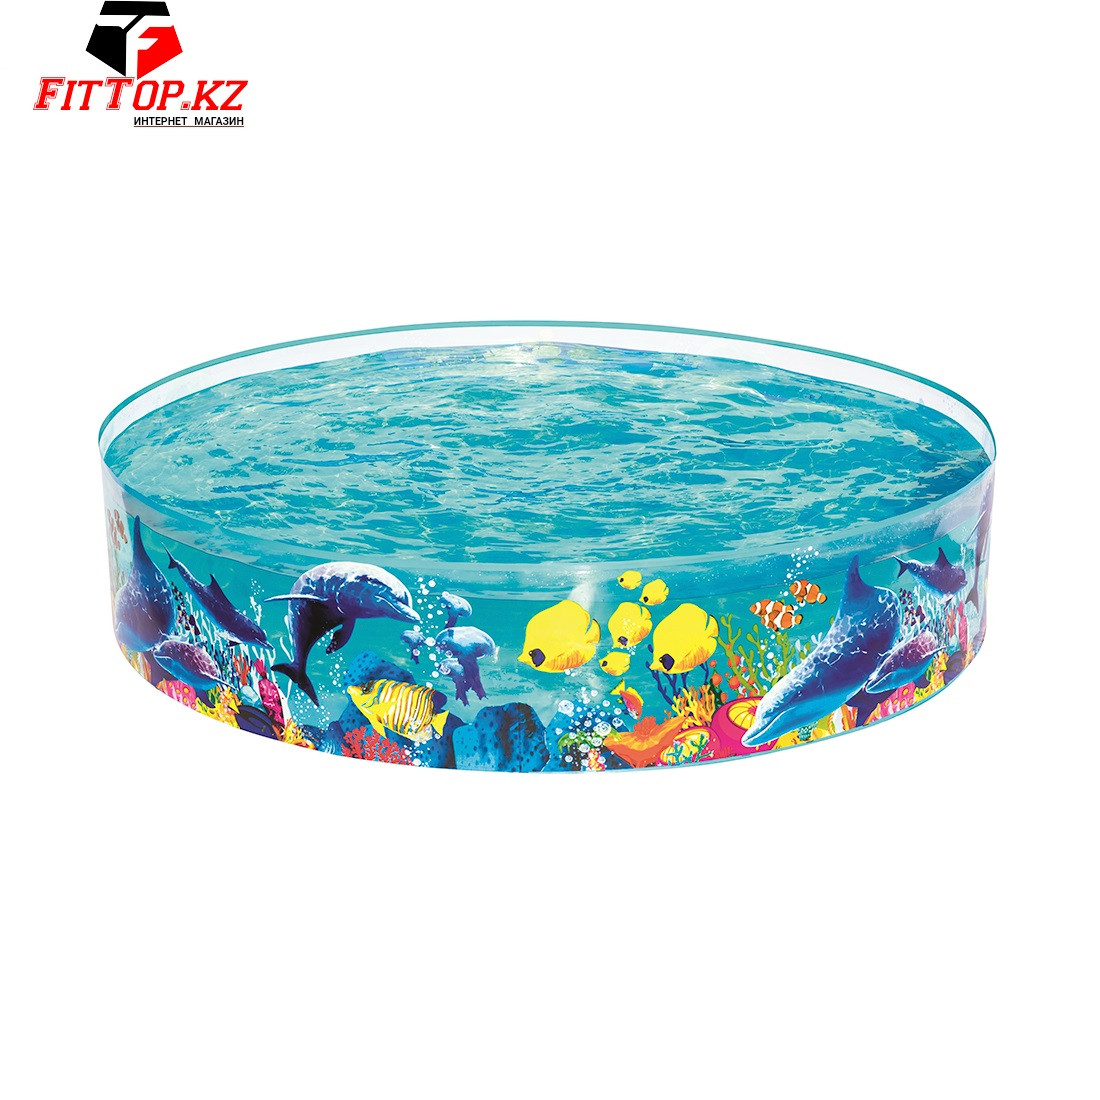 Детский бассейн с жёсткой стенкой Fill 'n Fun Odyssey 183 х 38 см, BESTWAY, 55030